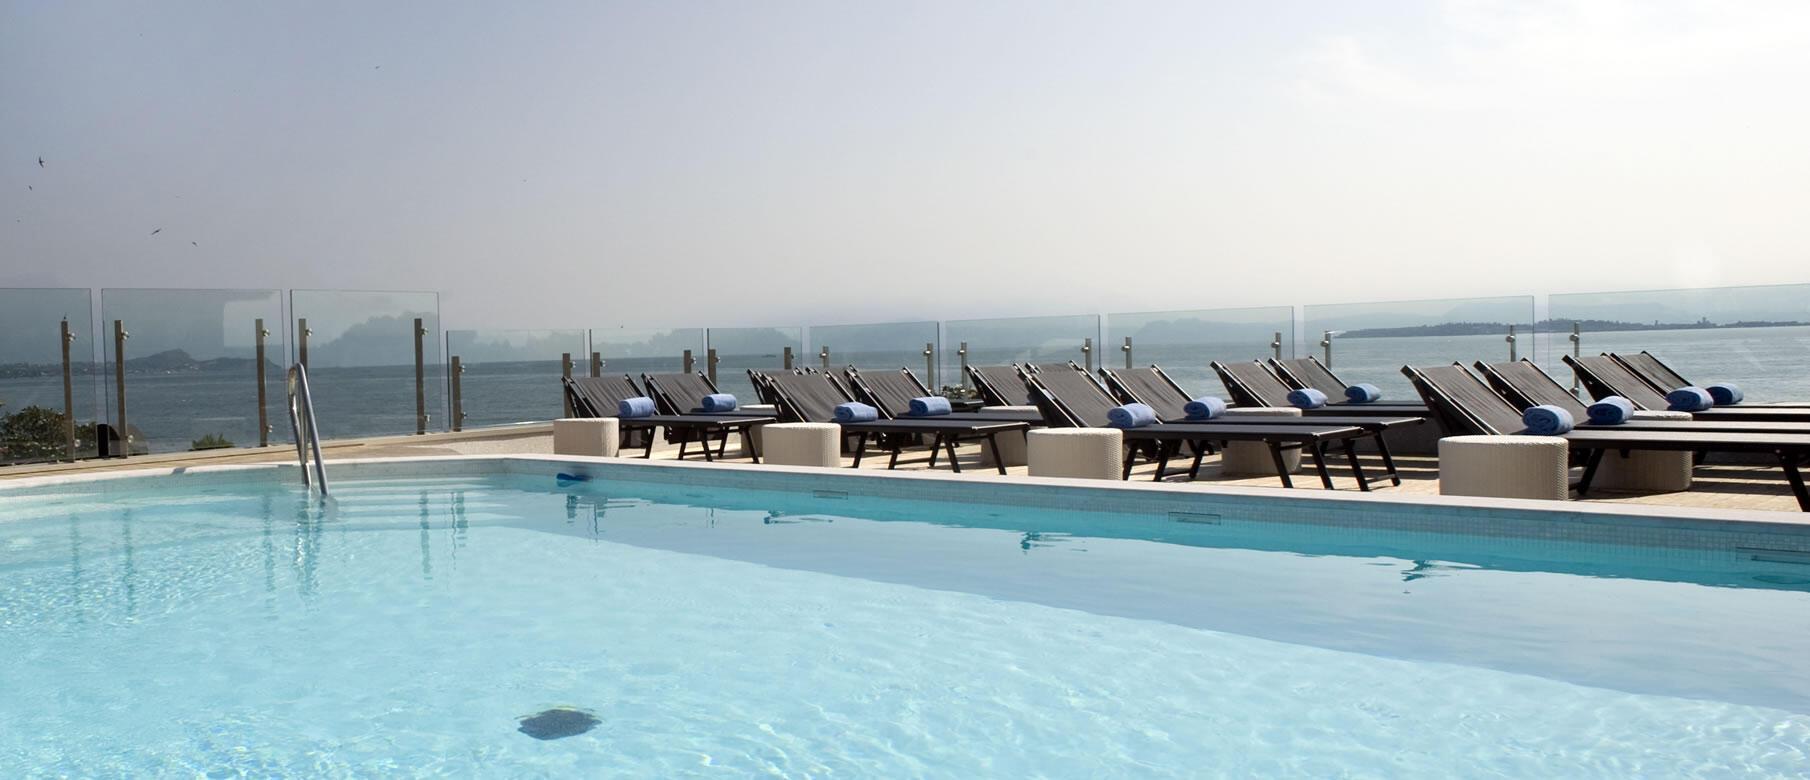 Hotel 4 stelle con piscina desenzano park hotel con piscina panoramica lago di garda - Hotel lago di garda con piscina ...